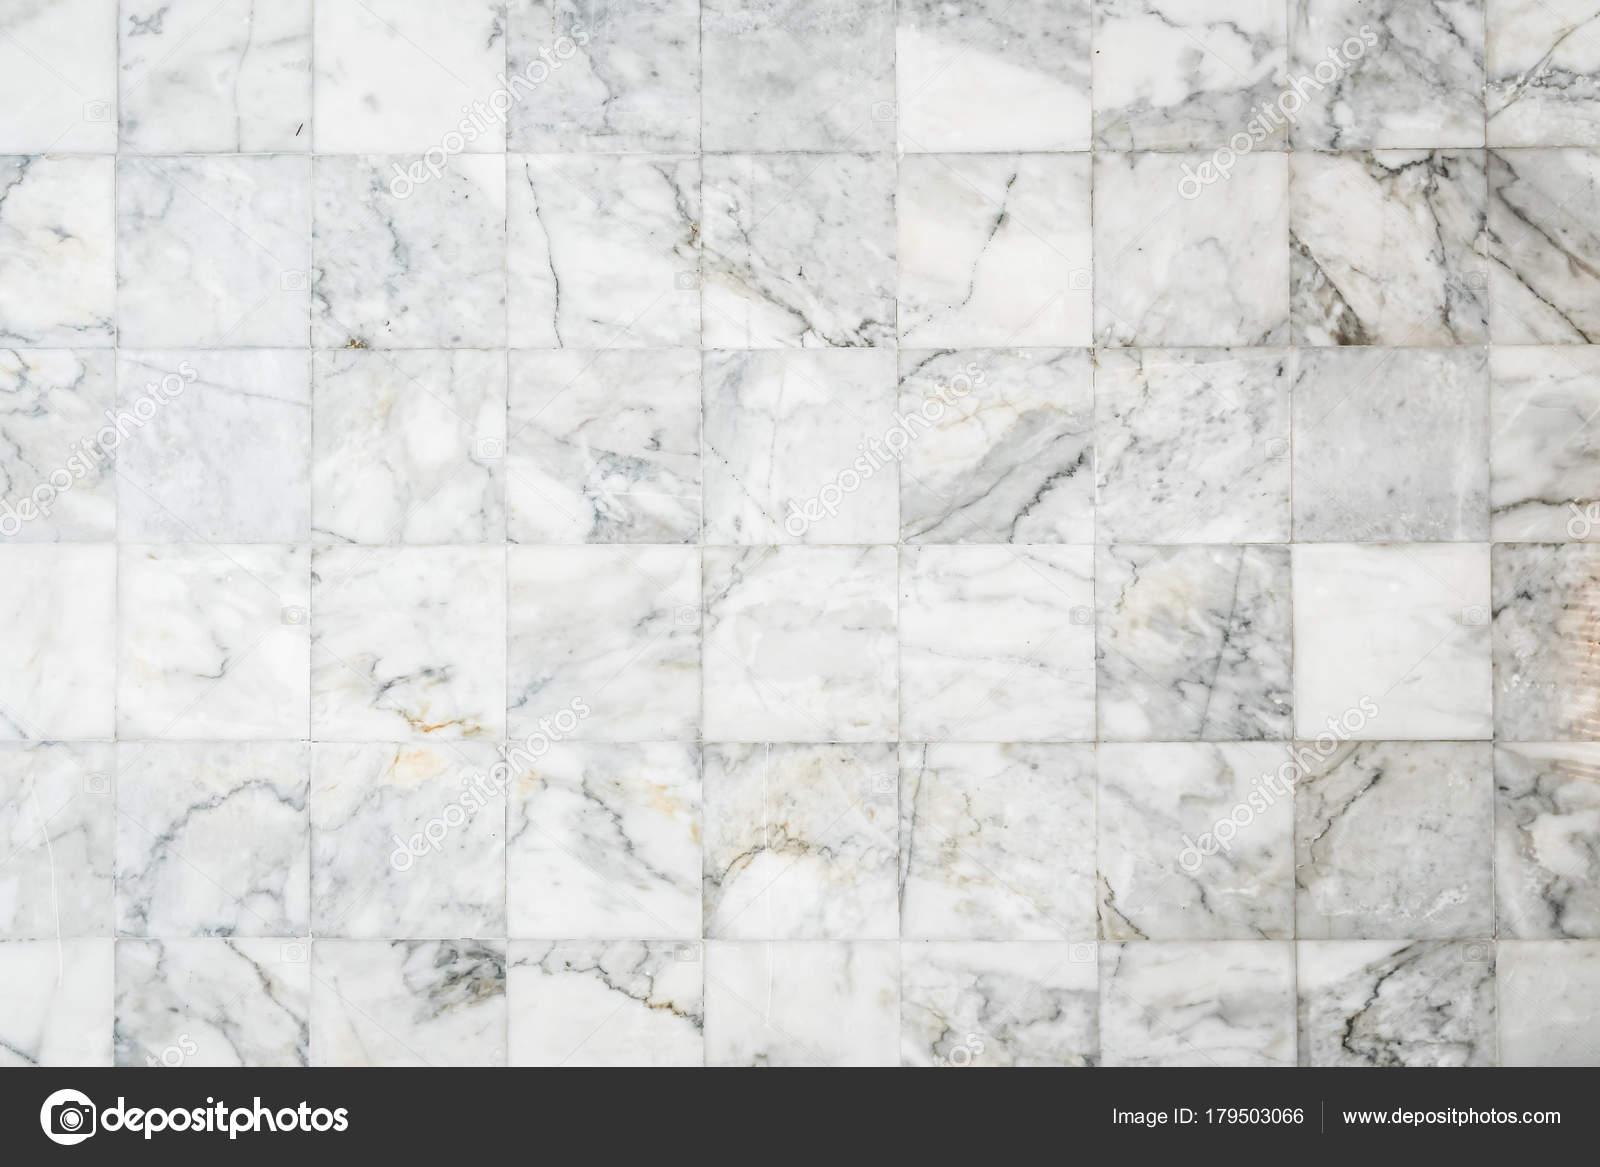 Grigio piastrelle texture superficie sfondo u foto stock